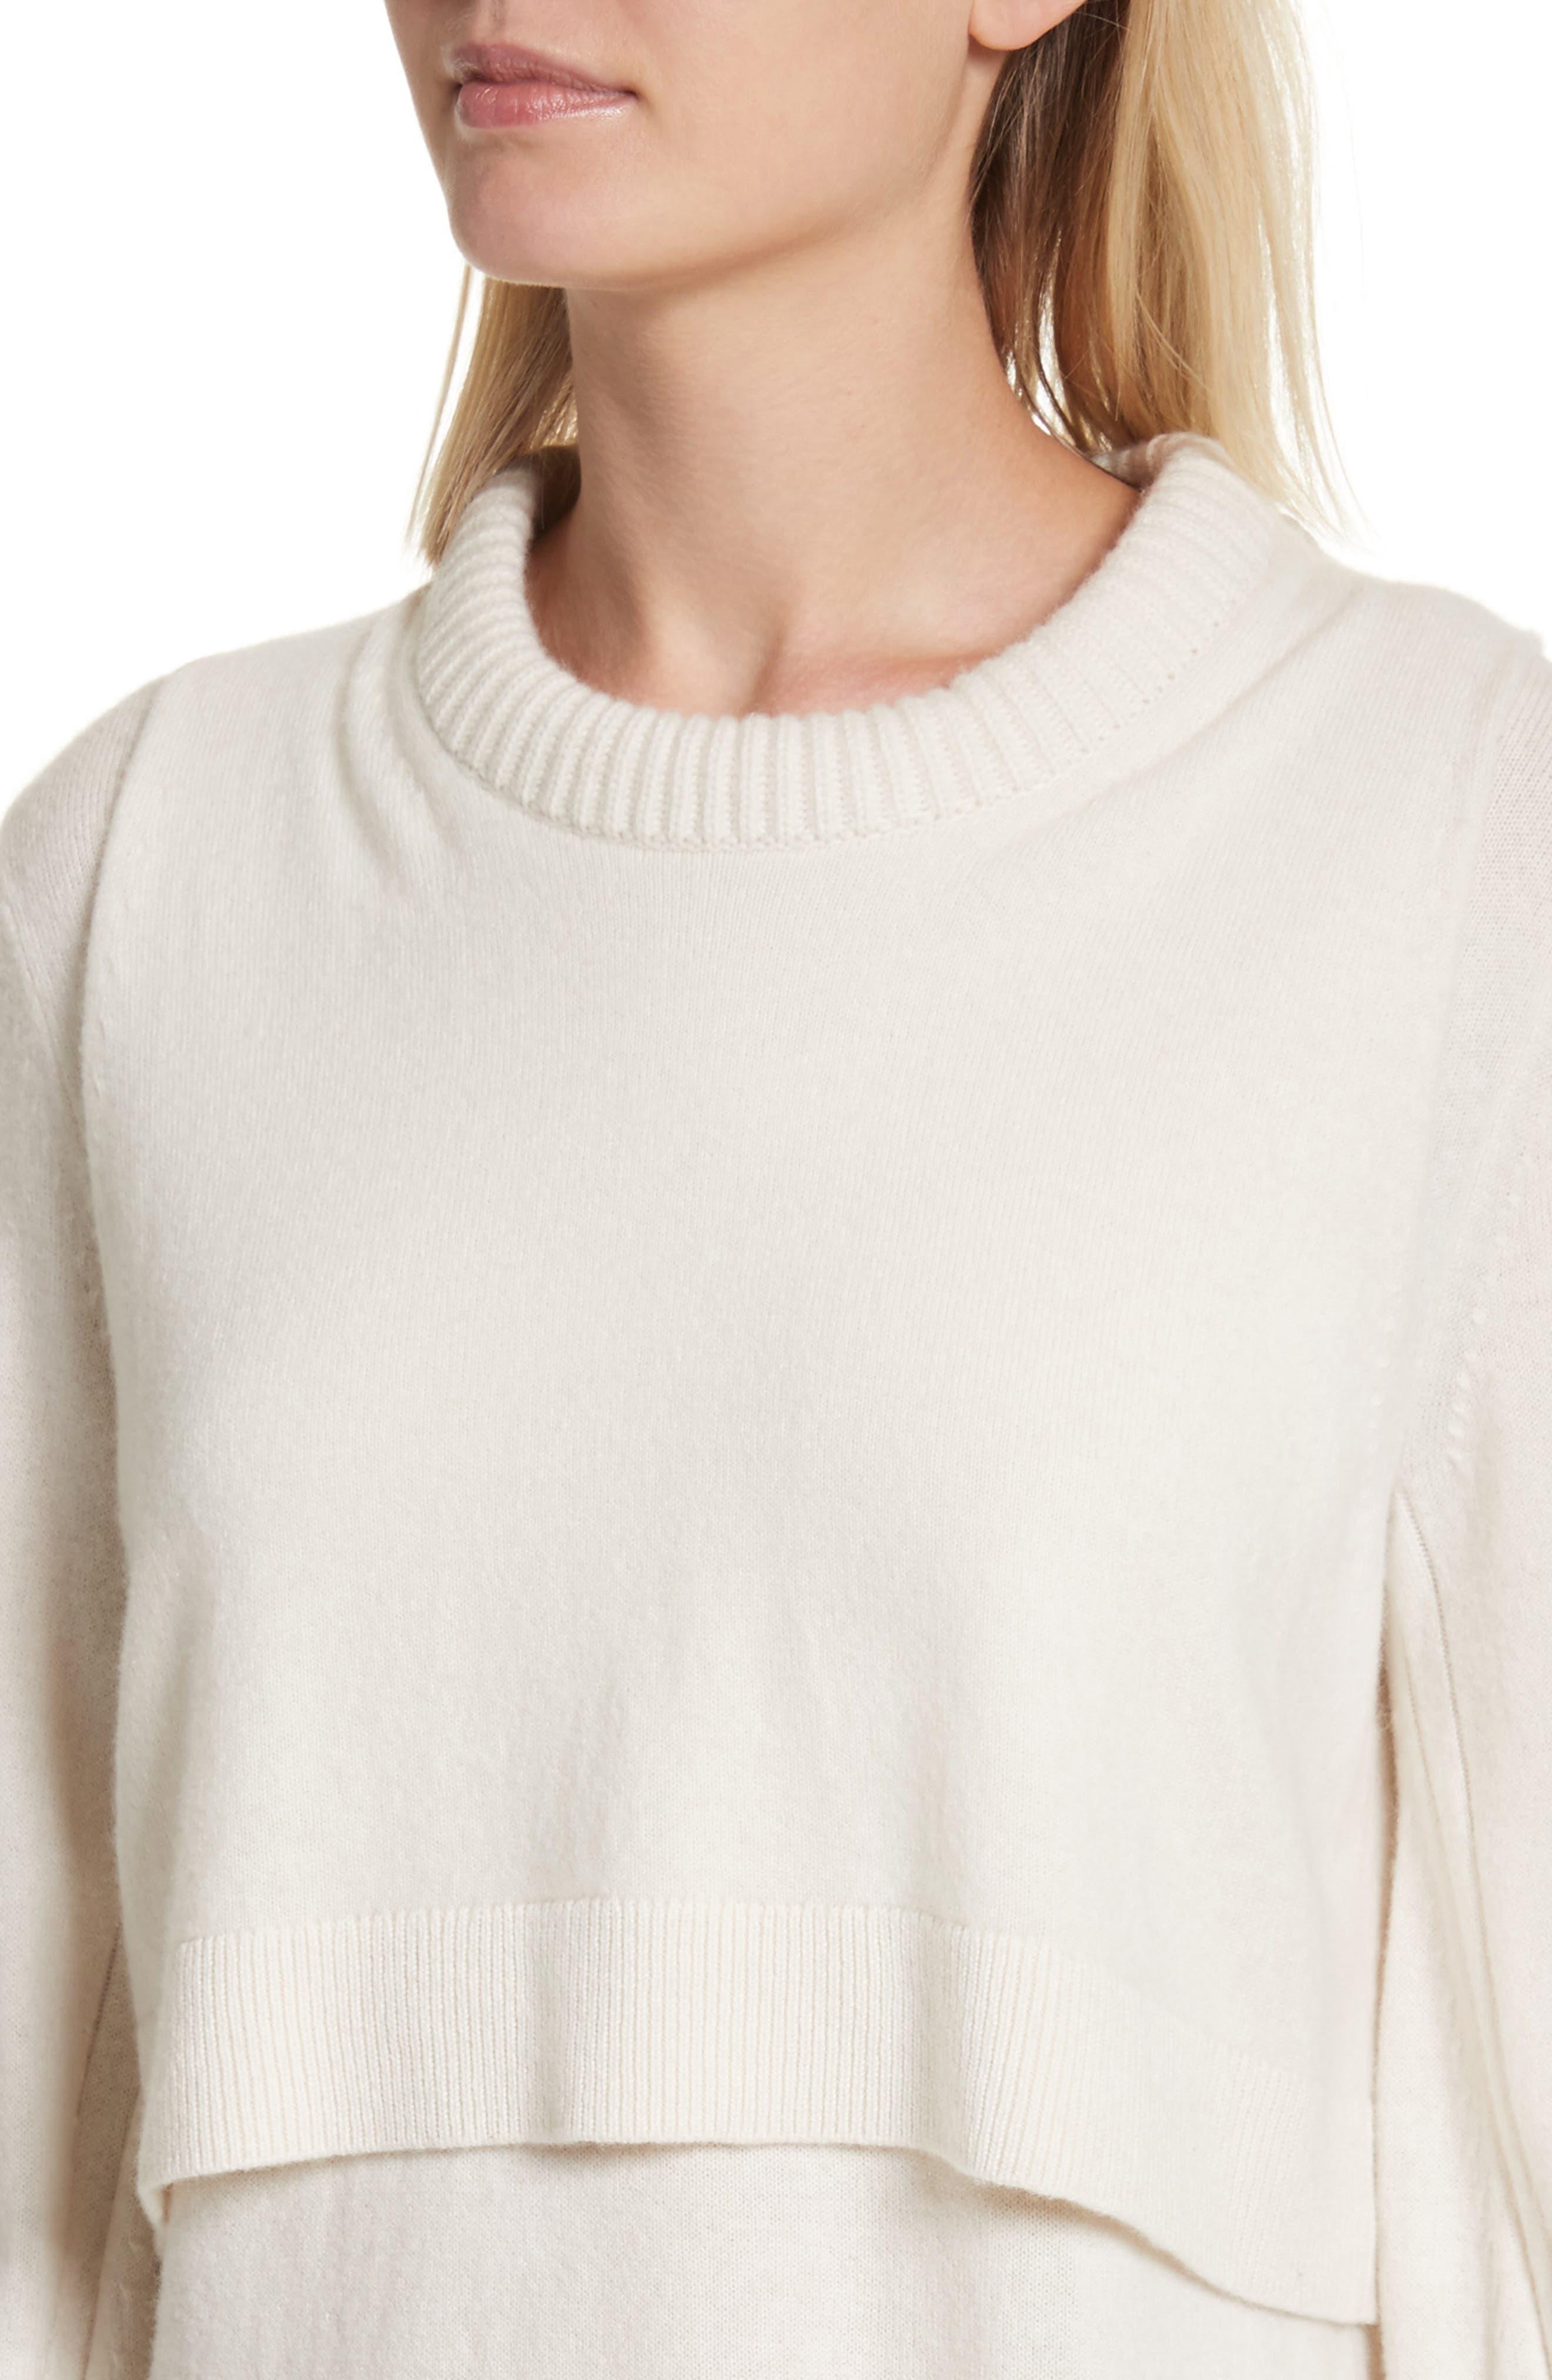 Preston Cashmere Crewneck Sweater,                             Alternate thumbnail 4, color,                             Ivory